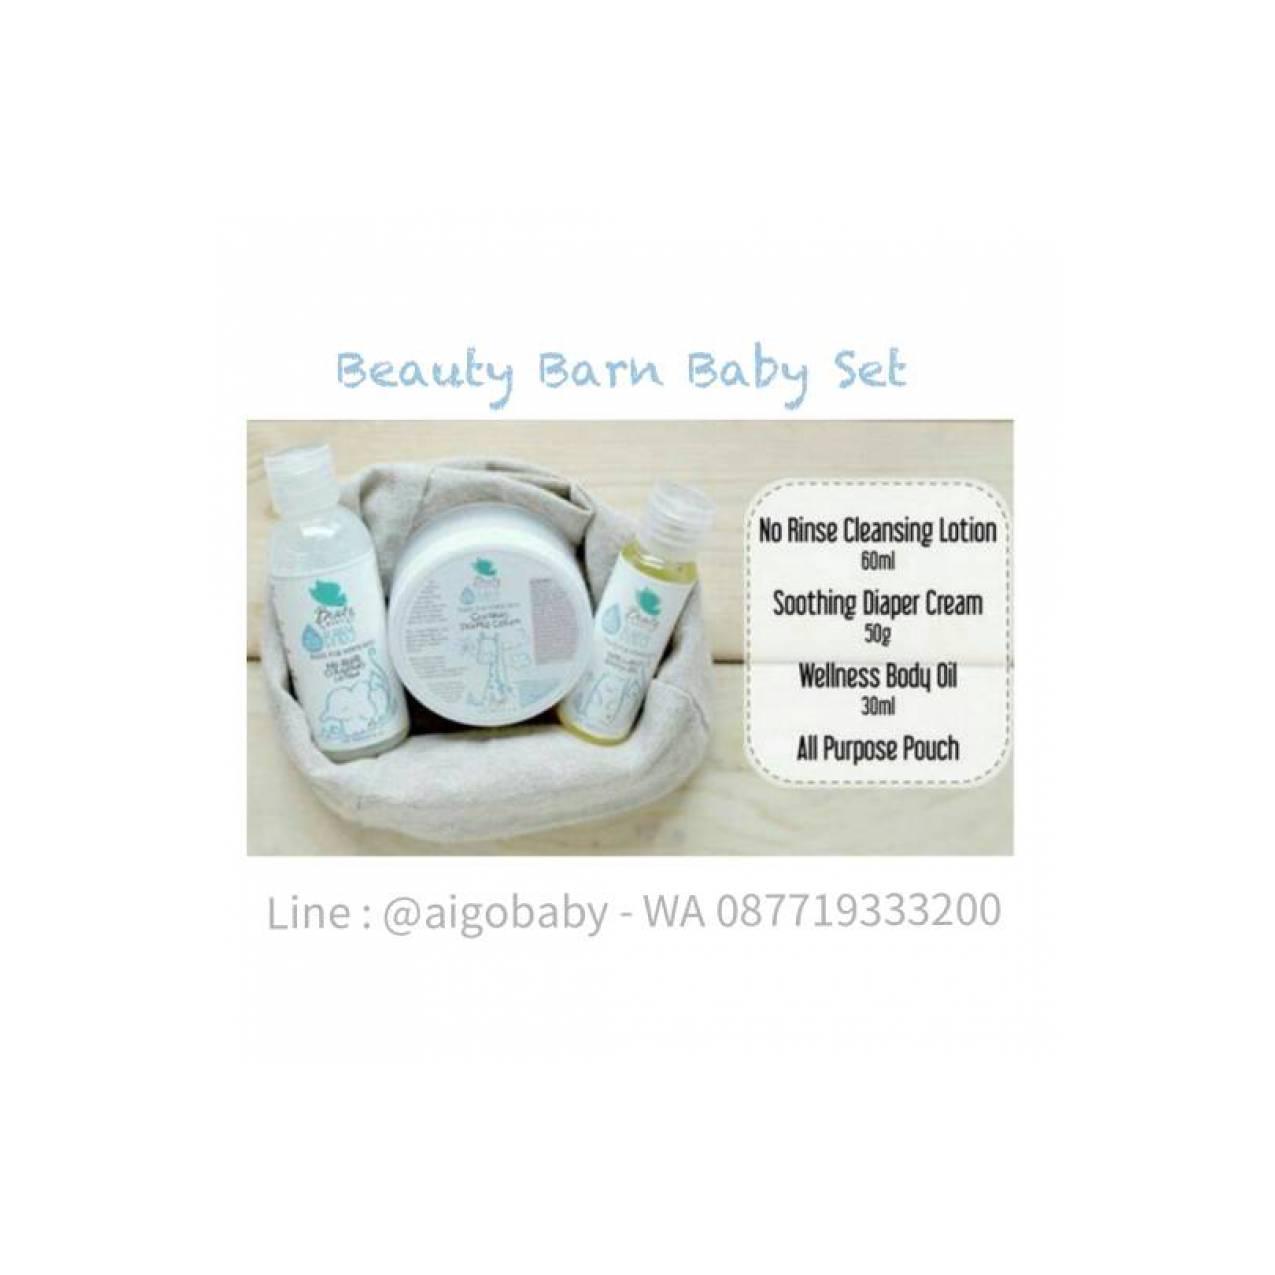 Beauty Barn Baby Wellness Body Oil 120ml Daftar Harga Terbaru Dan Aromatherapy Feeve 30ml Set Cocok Untuk Kado